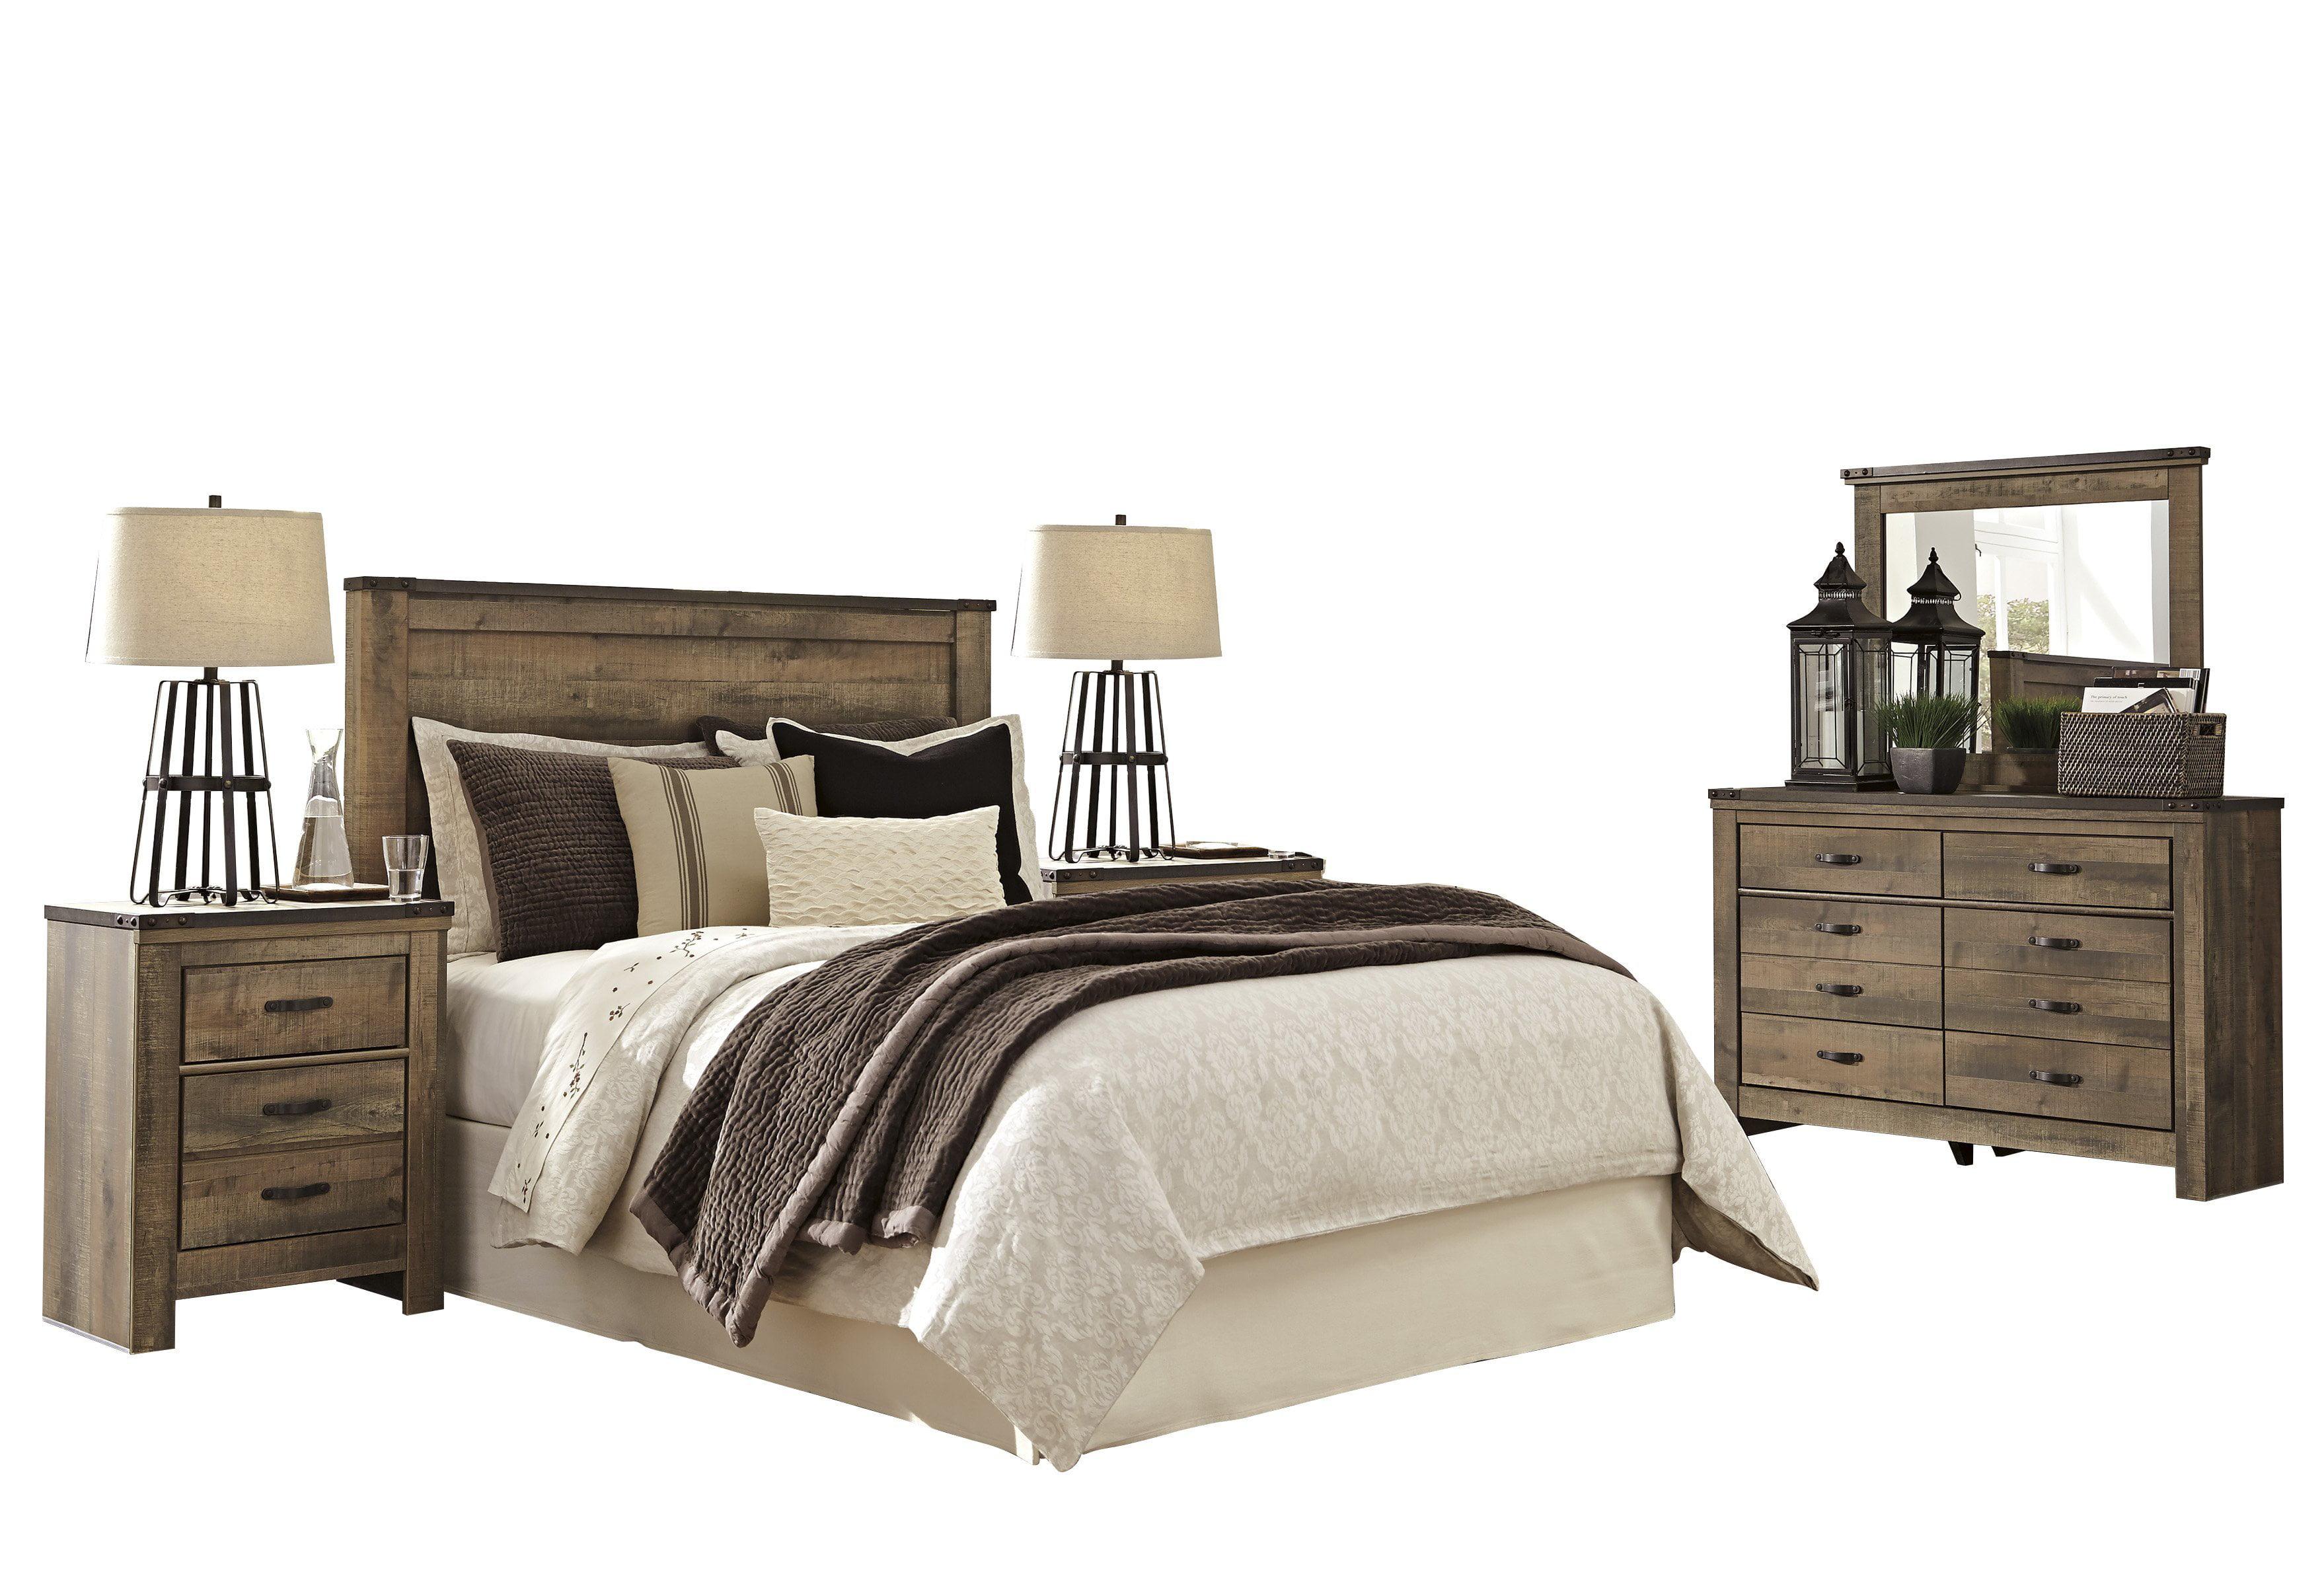 Ashley Furniture Trinell 5 Pc Bedroom Set E King Panel Headboard 2 Nightstand Dresser Mirror Brown Walmart Com Walmart Com